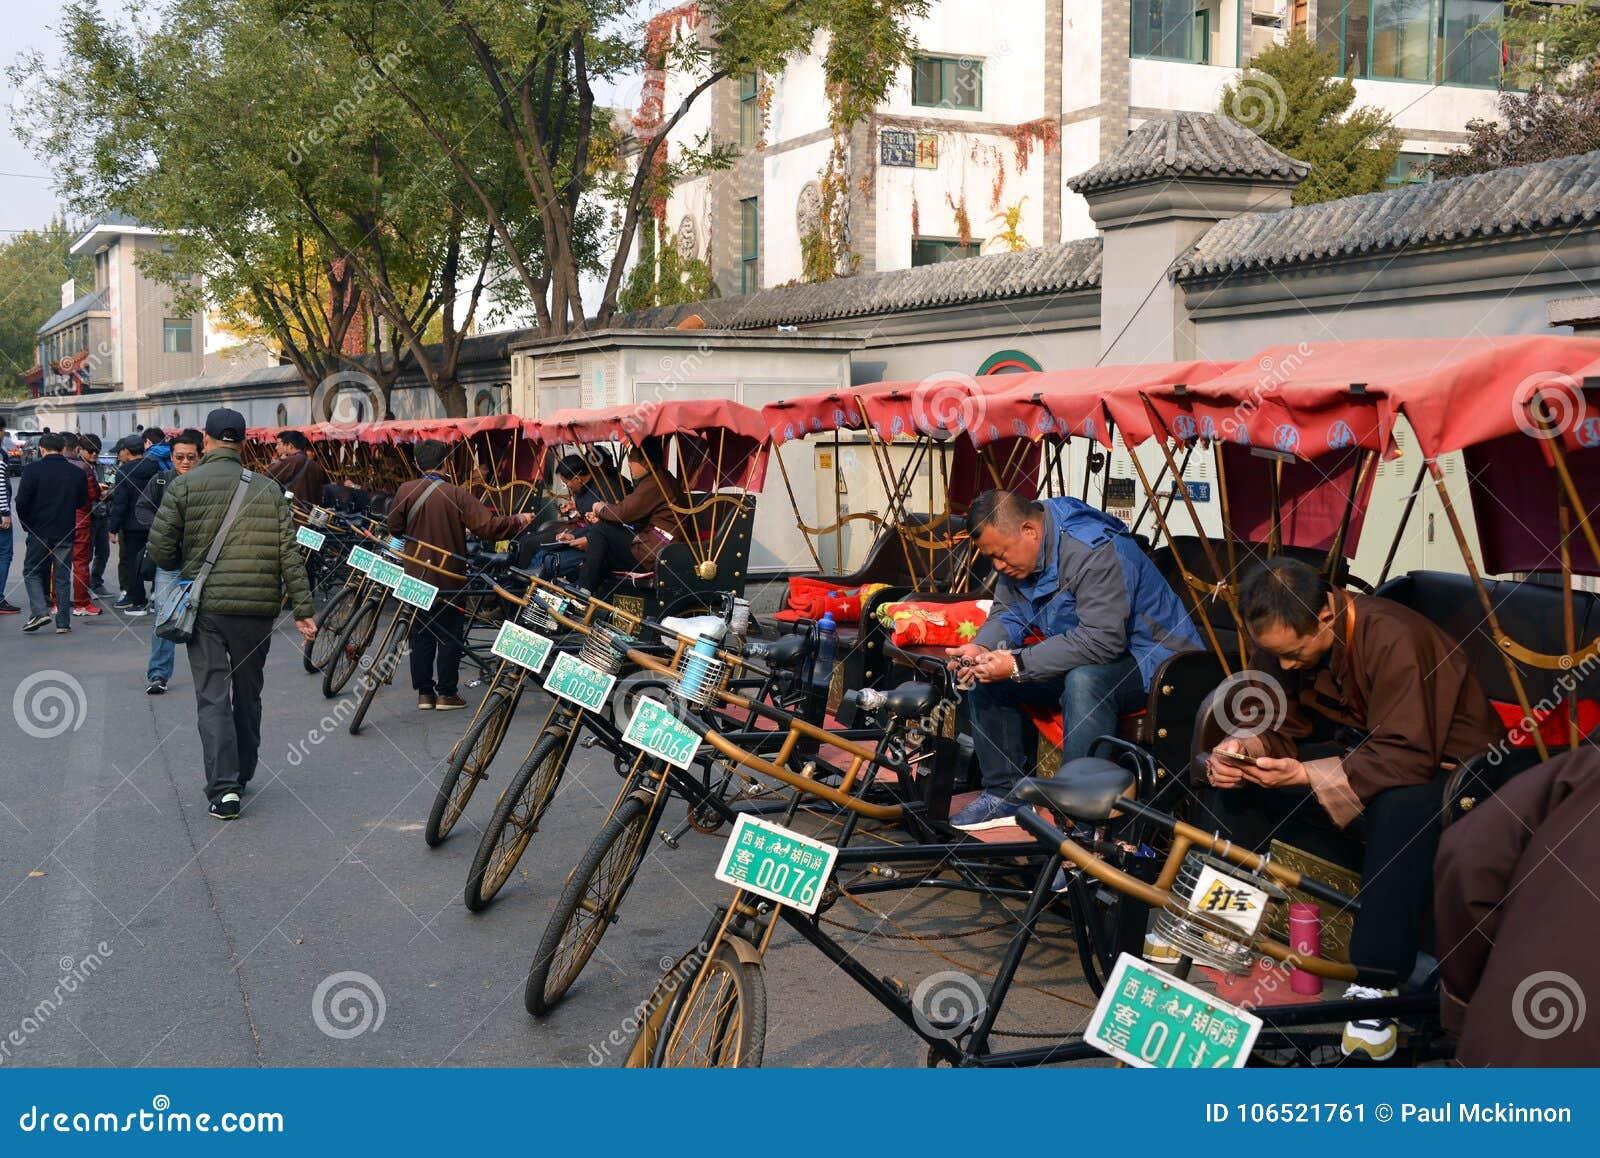 Pedicab riders wait for passengers